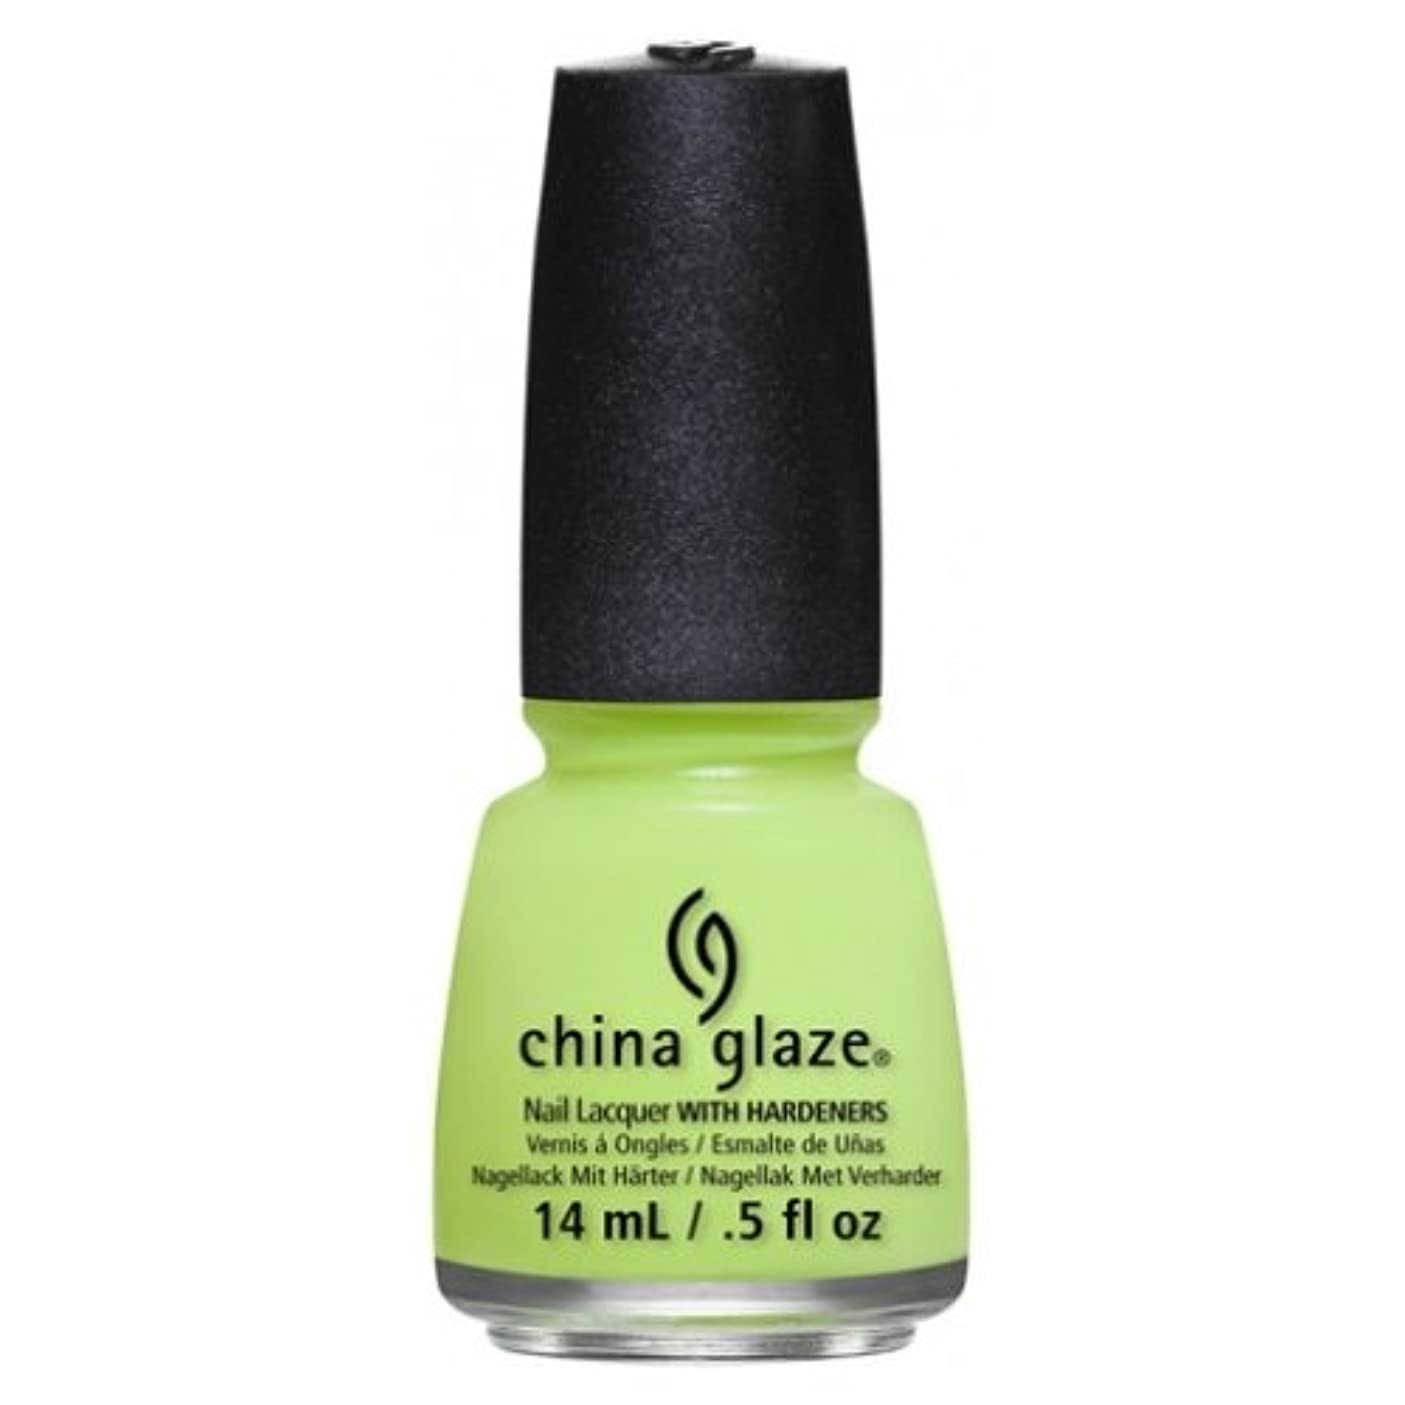 CHINA GLAZE Nail Lacquer - Art City Flourish - Grass Is Lime Greener (並行輸入品)